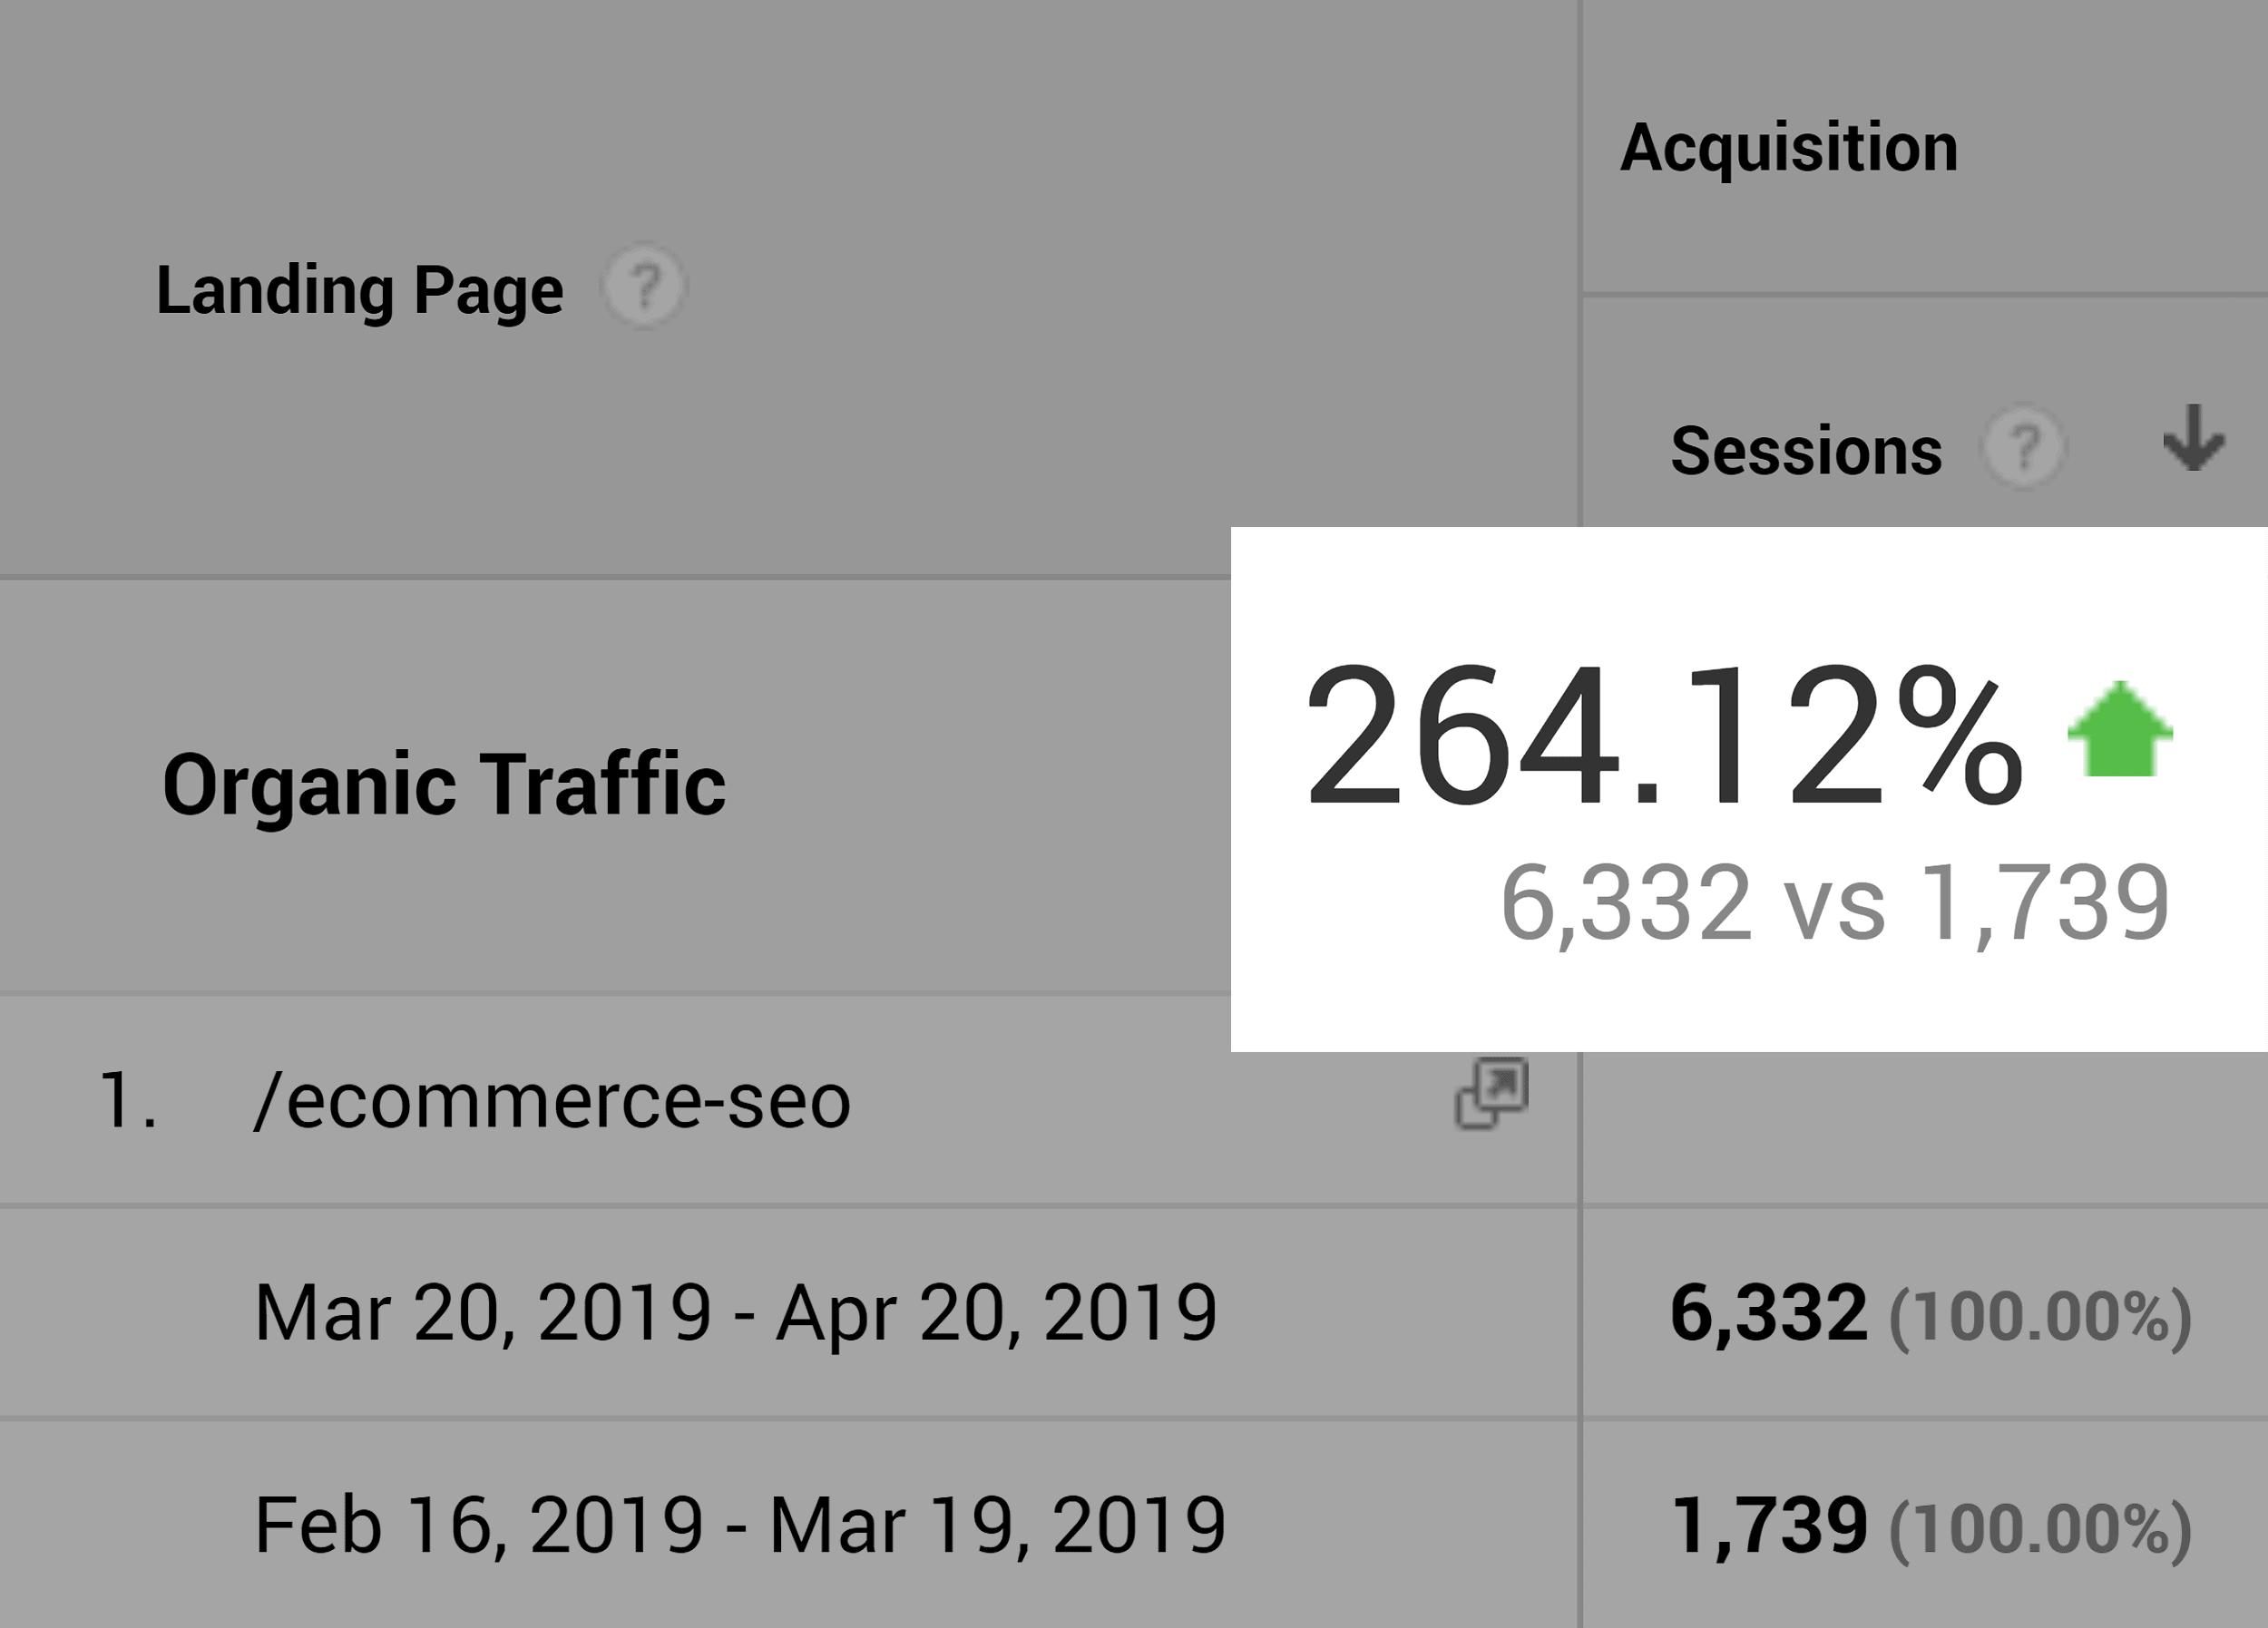 Ecommerce SEO – Organic traffic increase